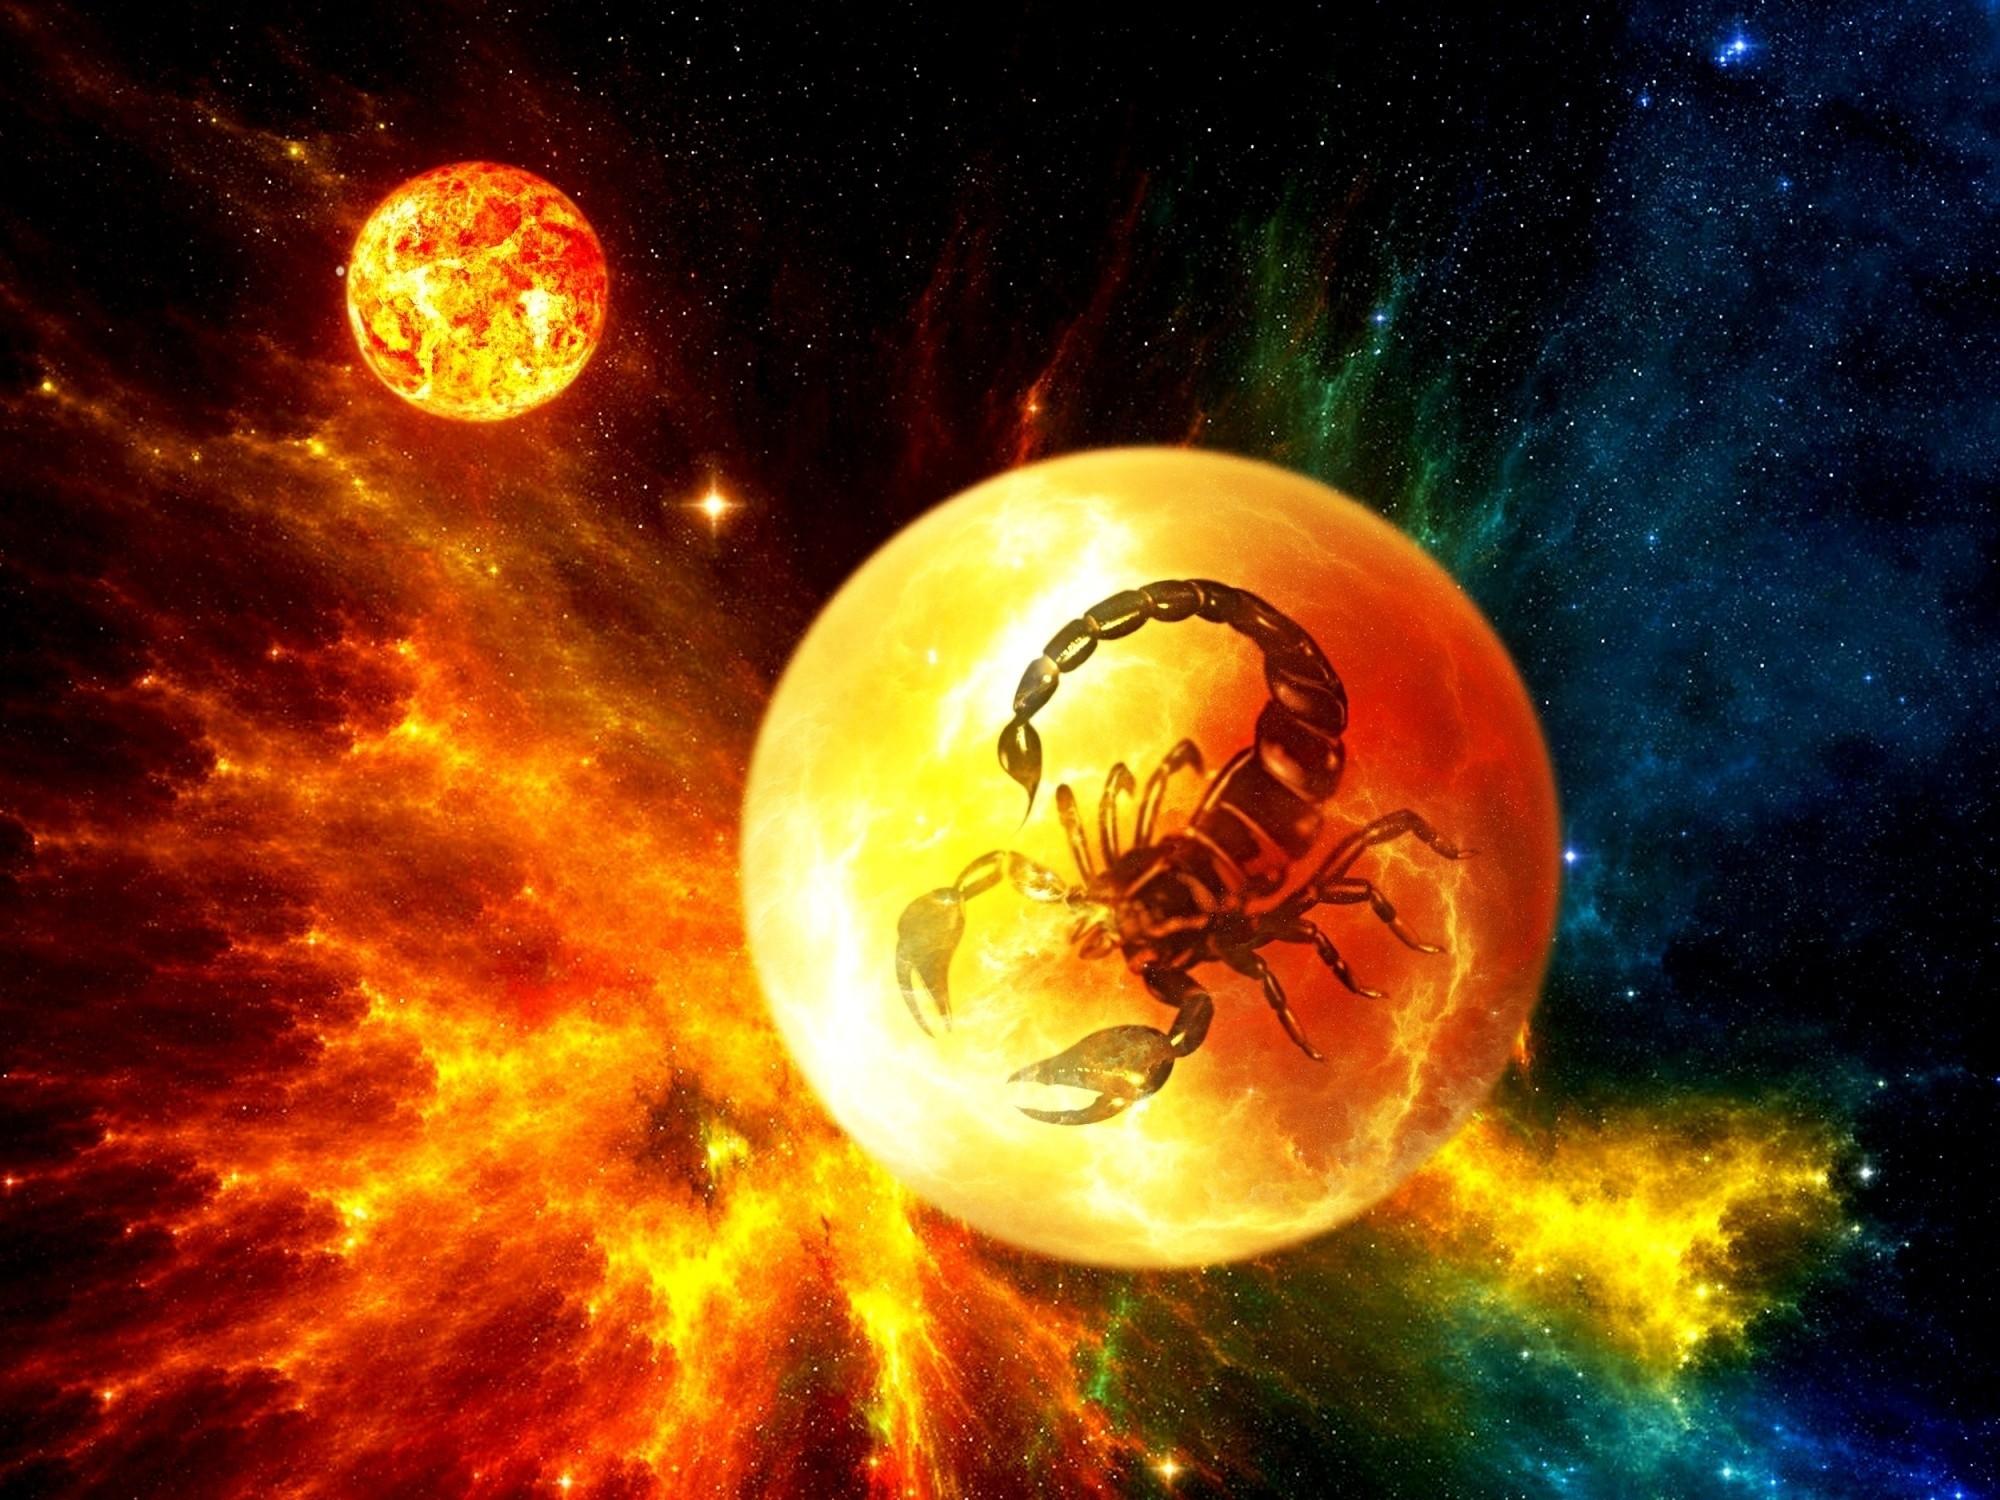 2000x1500 scorpio sci-fi zodiac planets cg nebula stars space wallpaper .